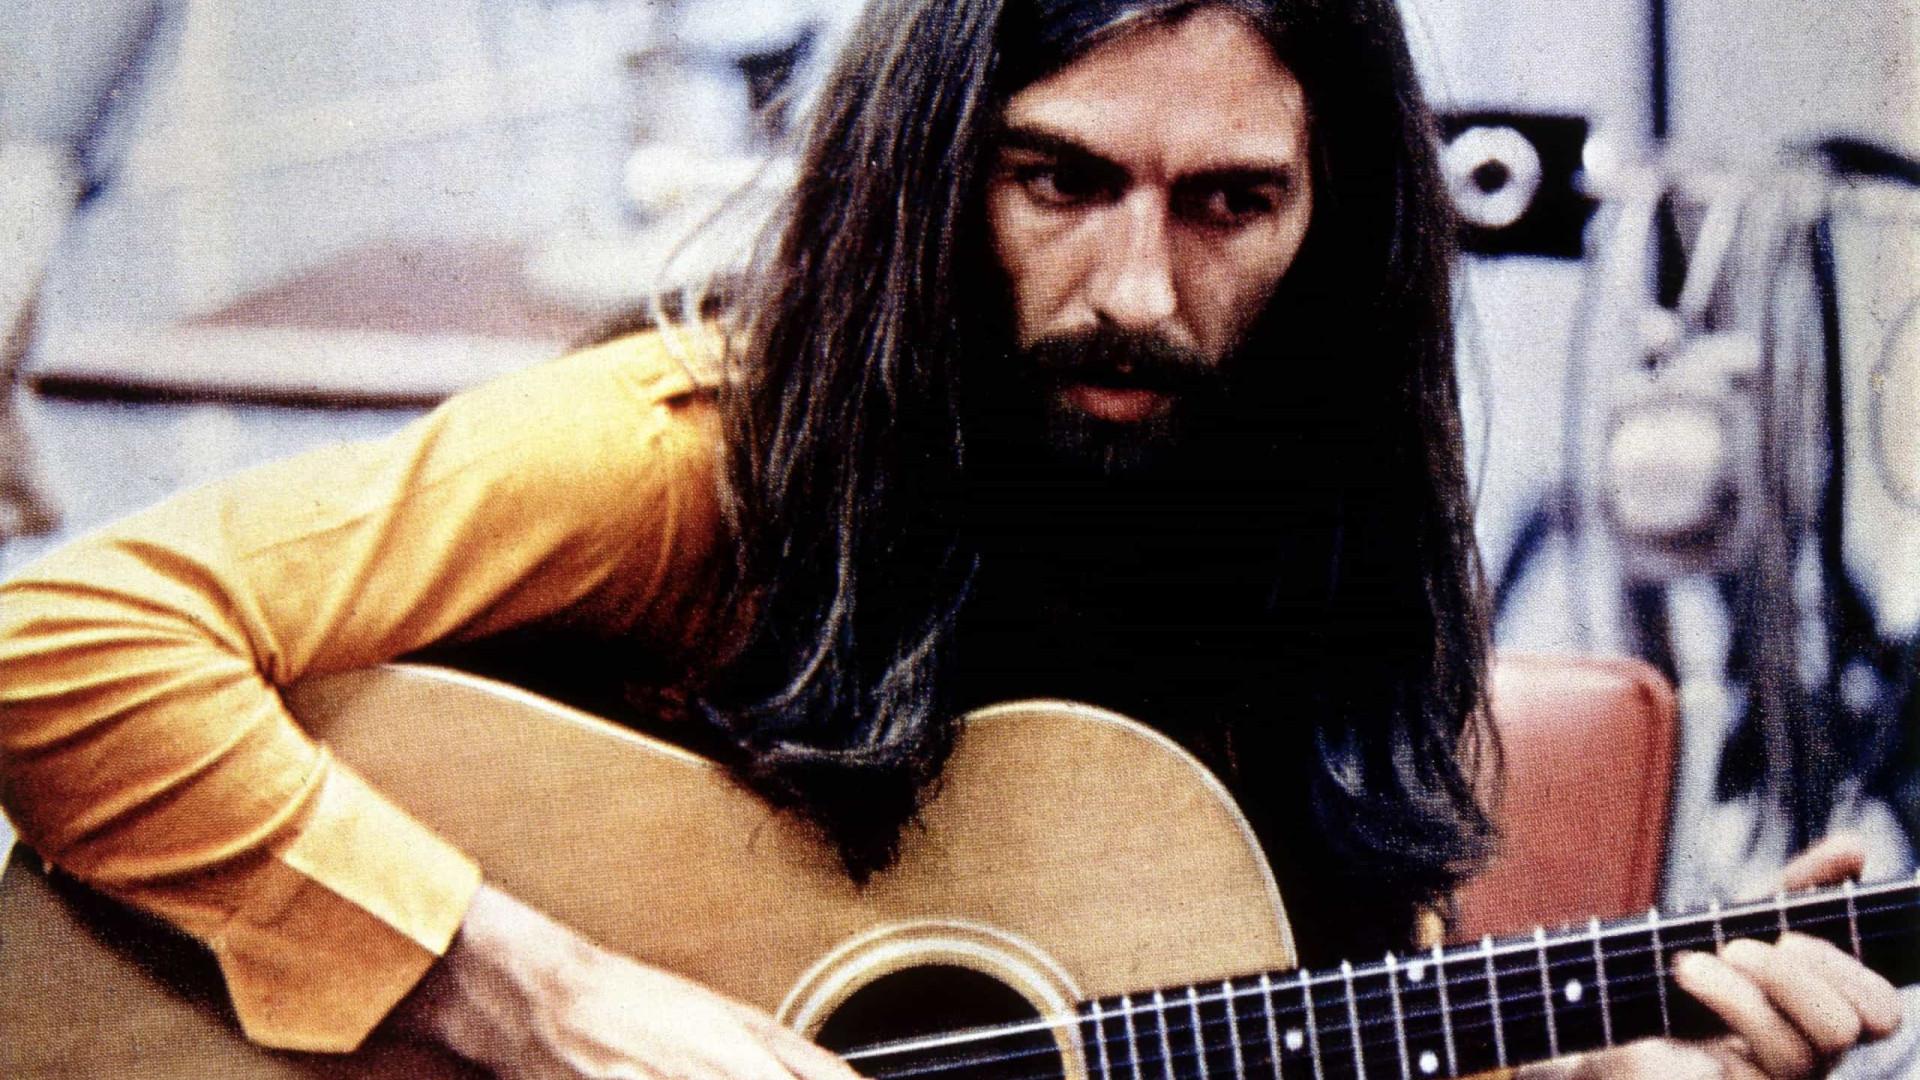 Guitarrista George Harrison: o Beatle discreto